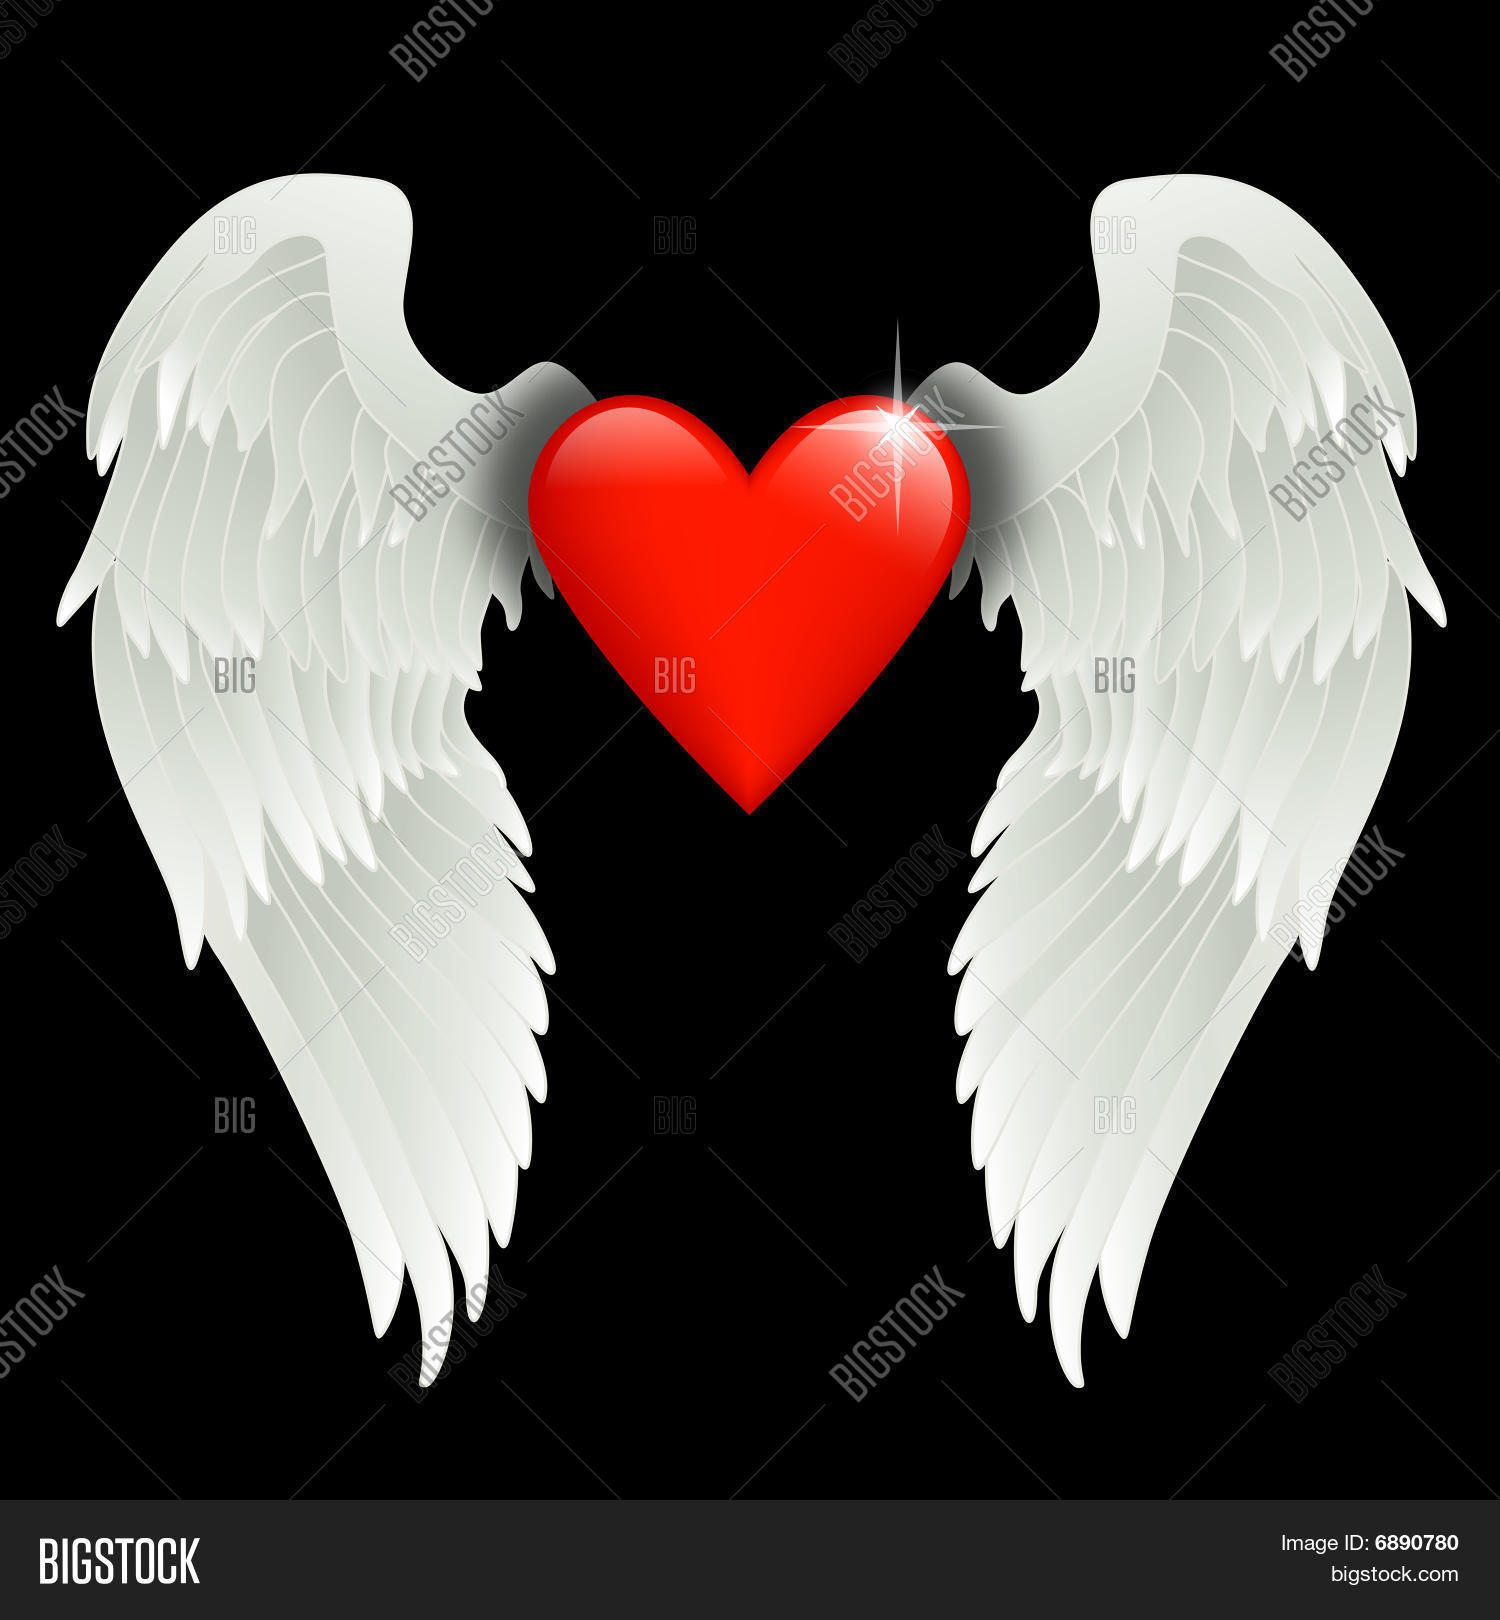 Heart Angel Wings Image Photo Free Trial Bigstock